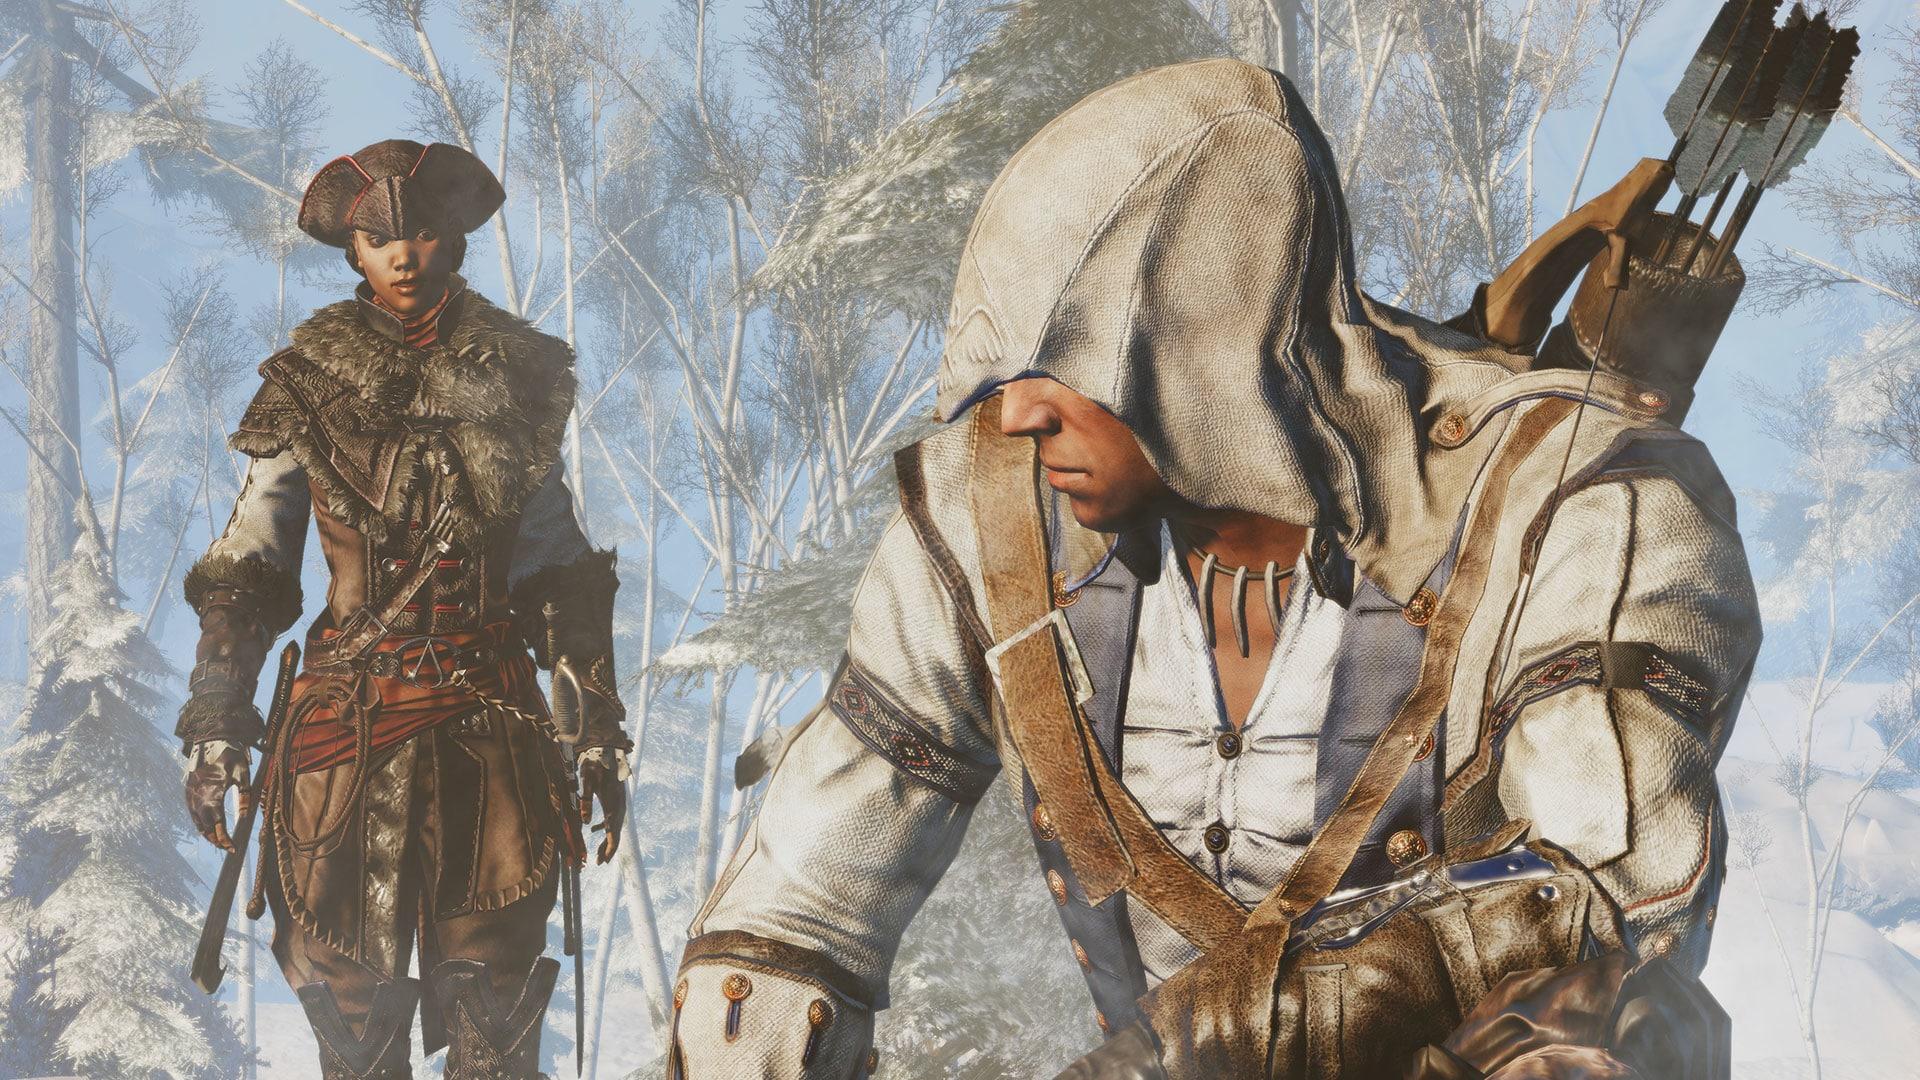 Assassin's Creed Grows (Viking) Horns